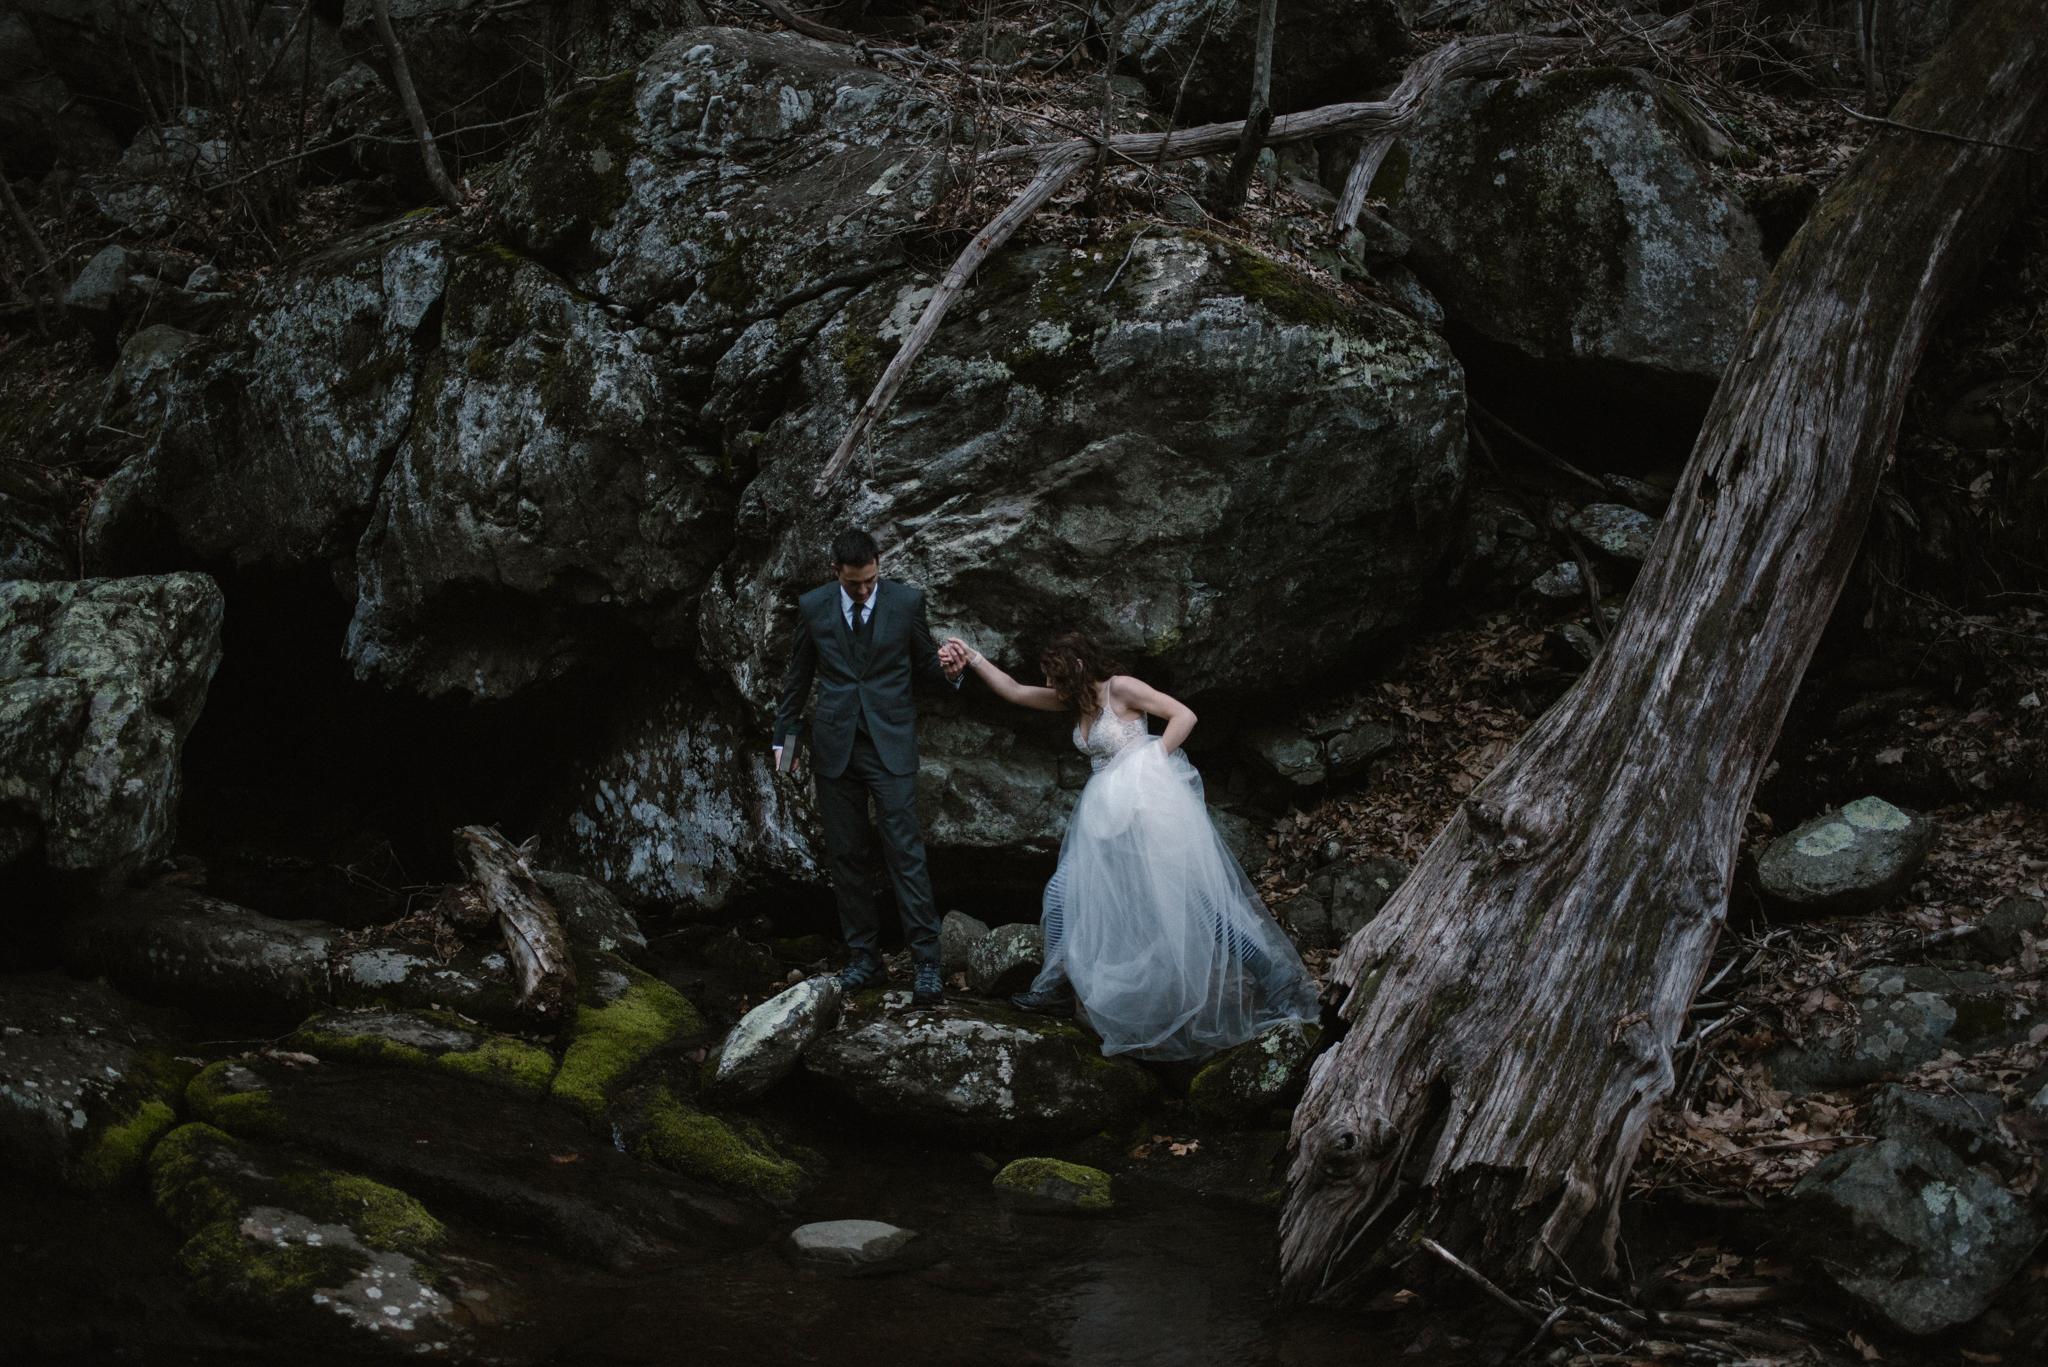 Stephanie and Steve - Shenandoah National Park Elopement - Sunrise Hiking Elopement - Adventurous Elopement - Virginia Elopement Photographer - Shenandoah national Park Wedding Photographer - White Sails Creative_31.jpg